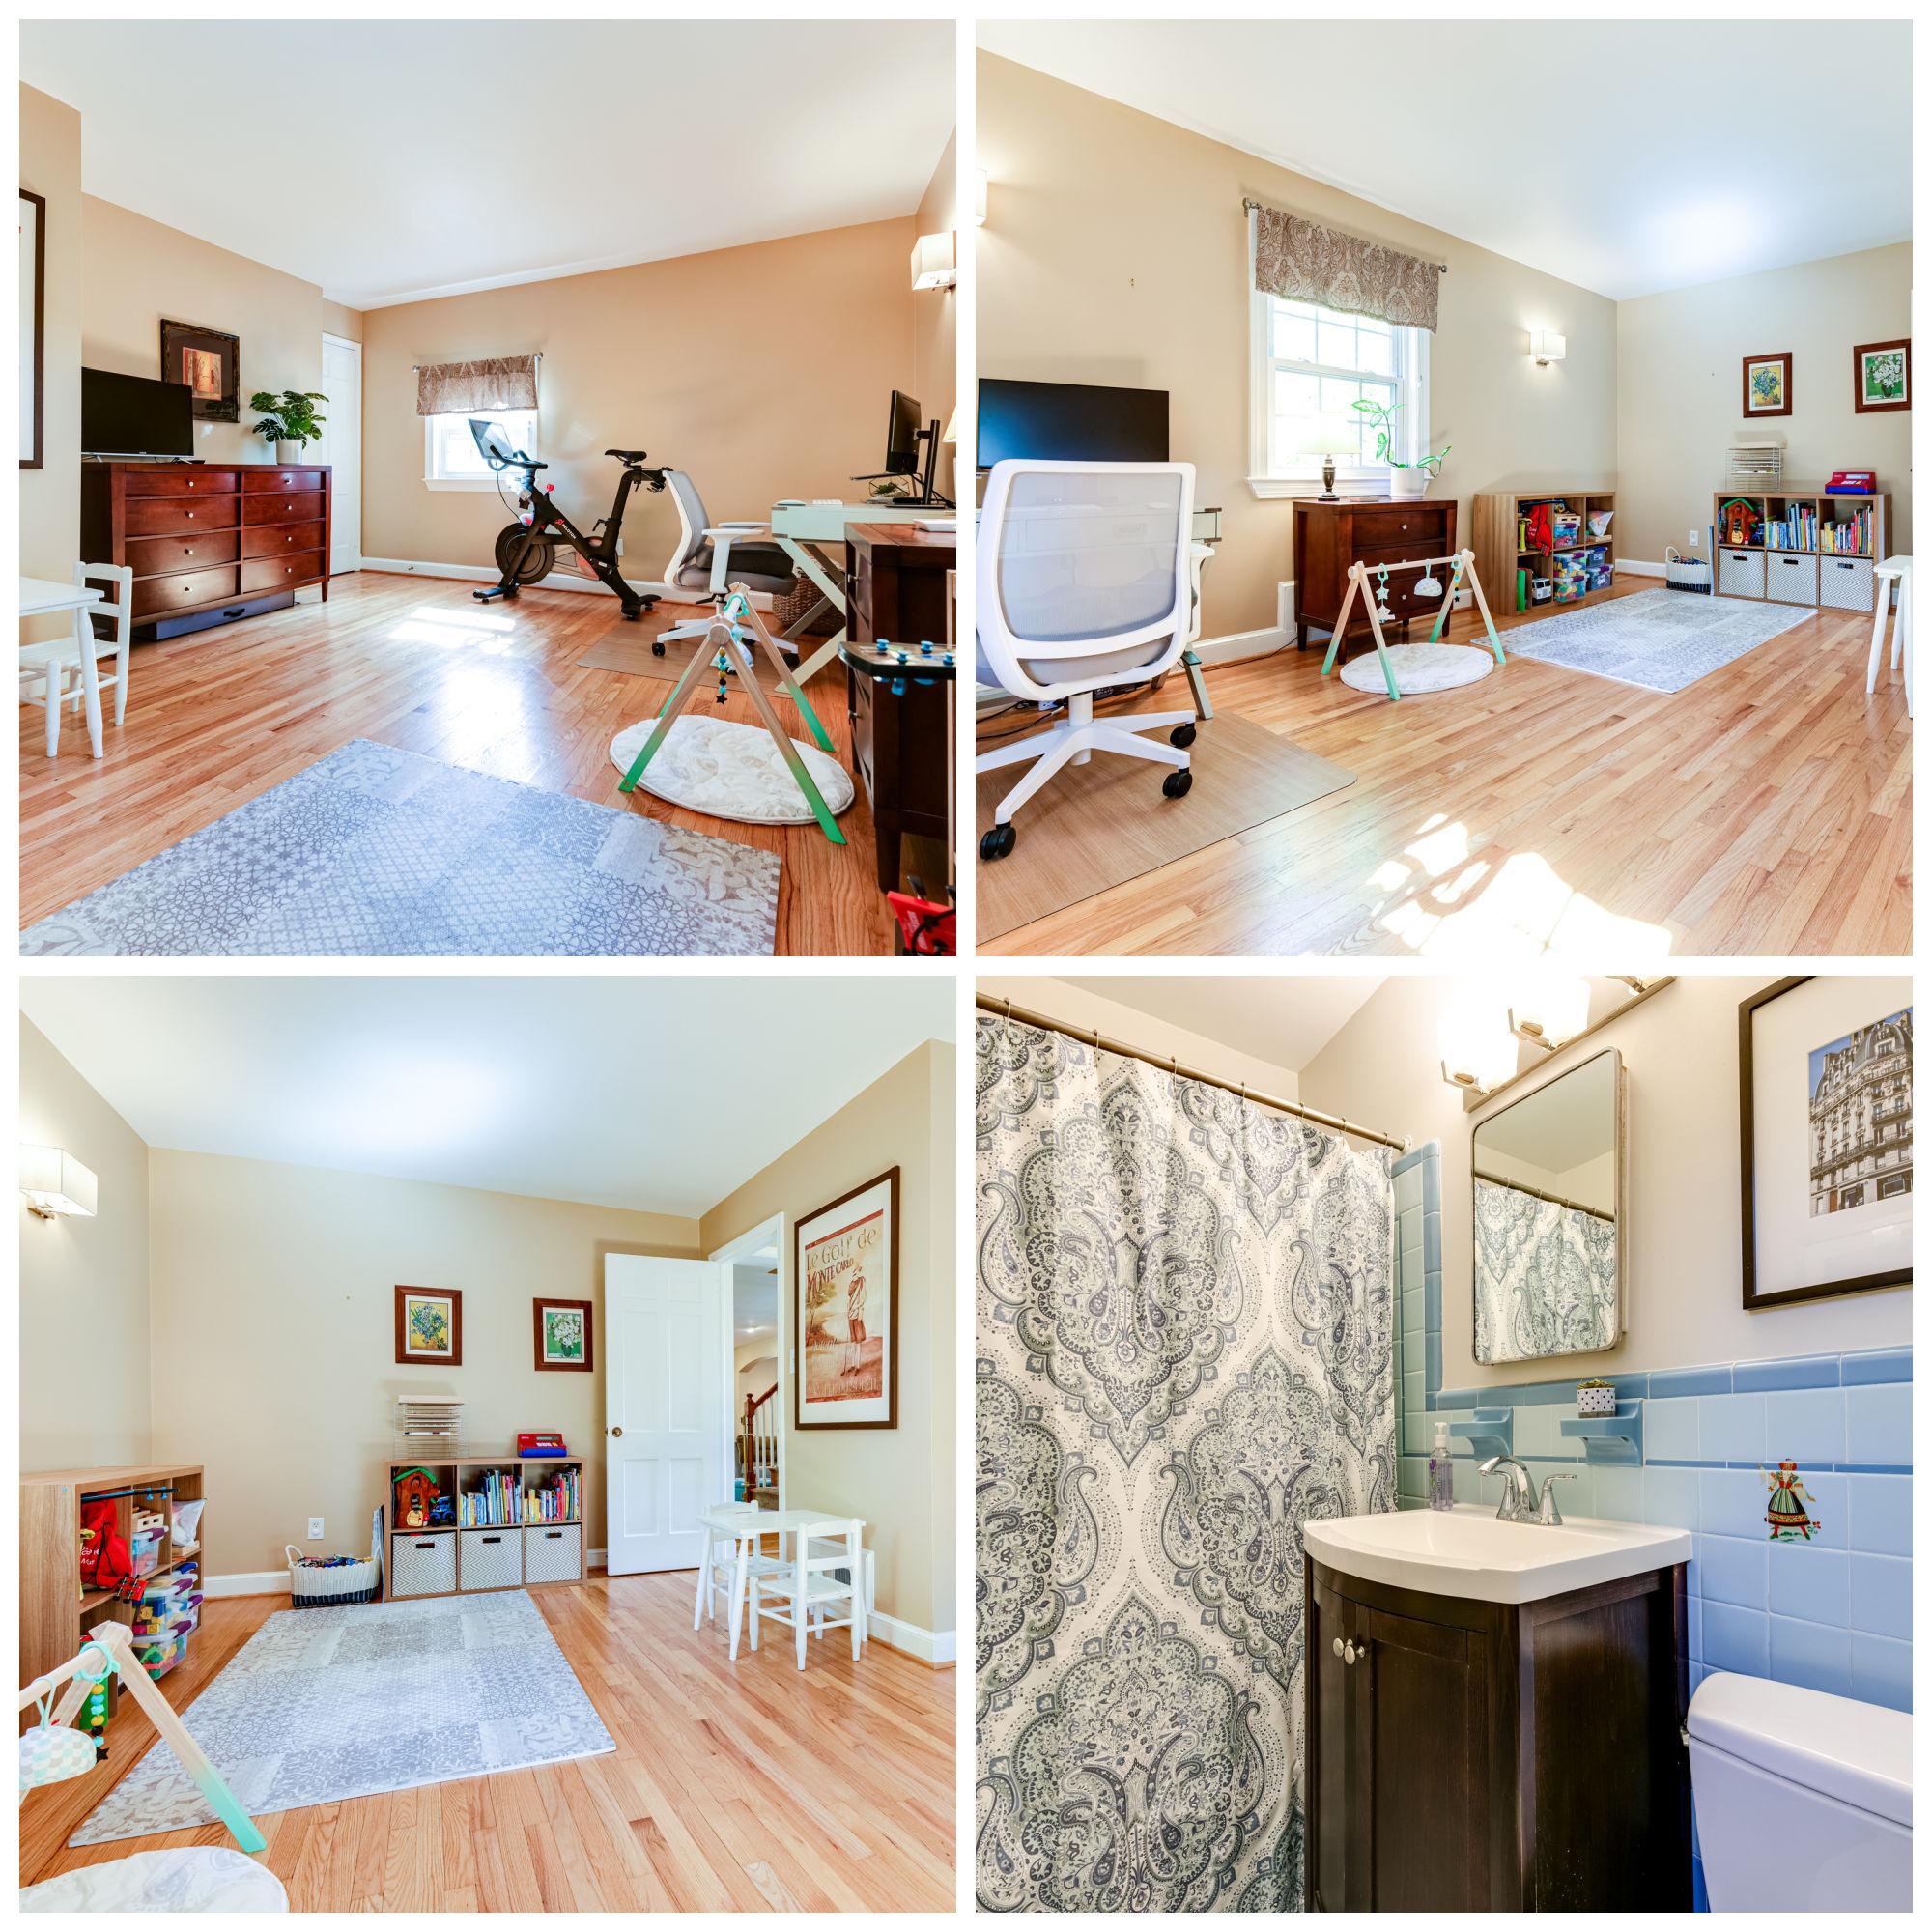 167 N Columbus St, Arlington- Entry Level Bed and Bath